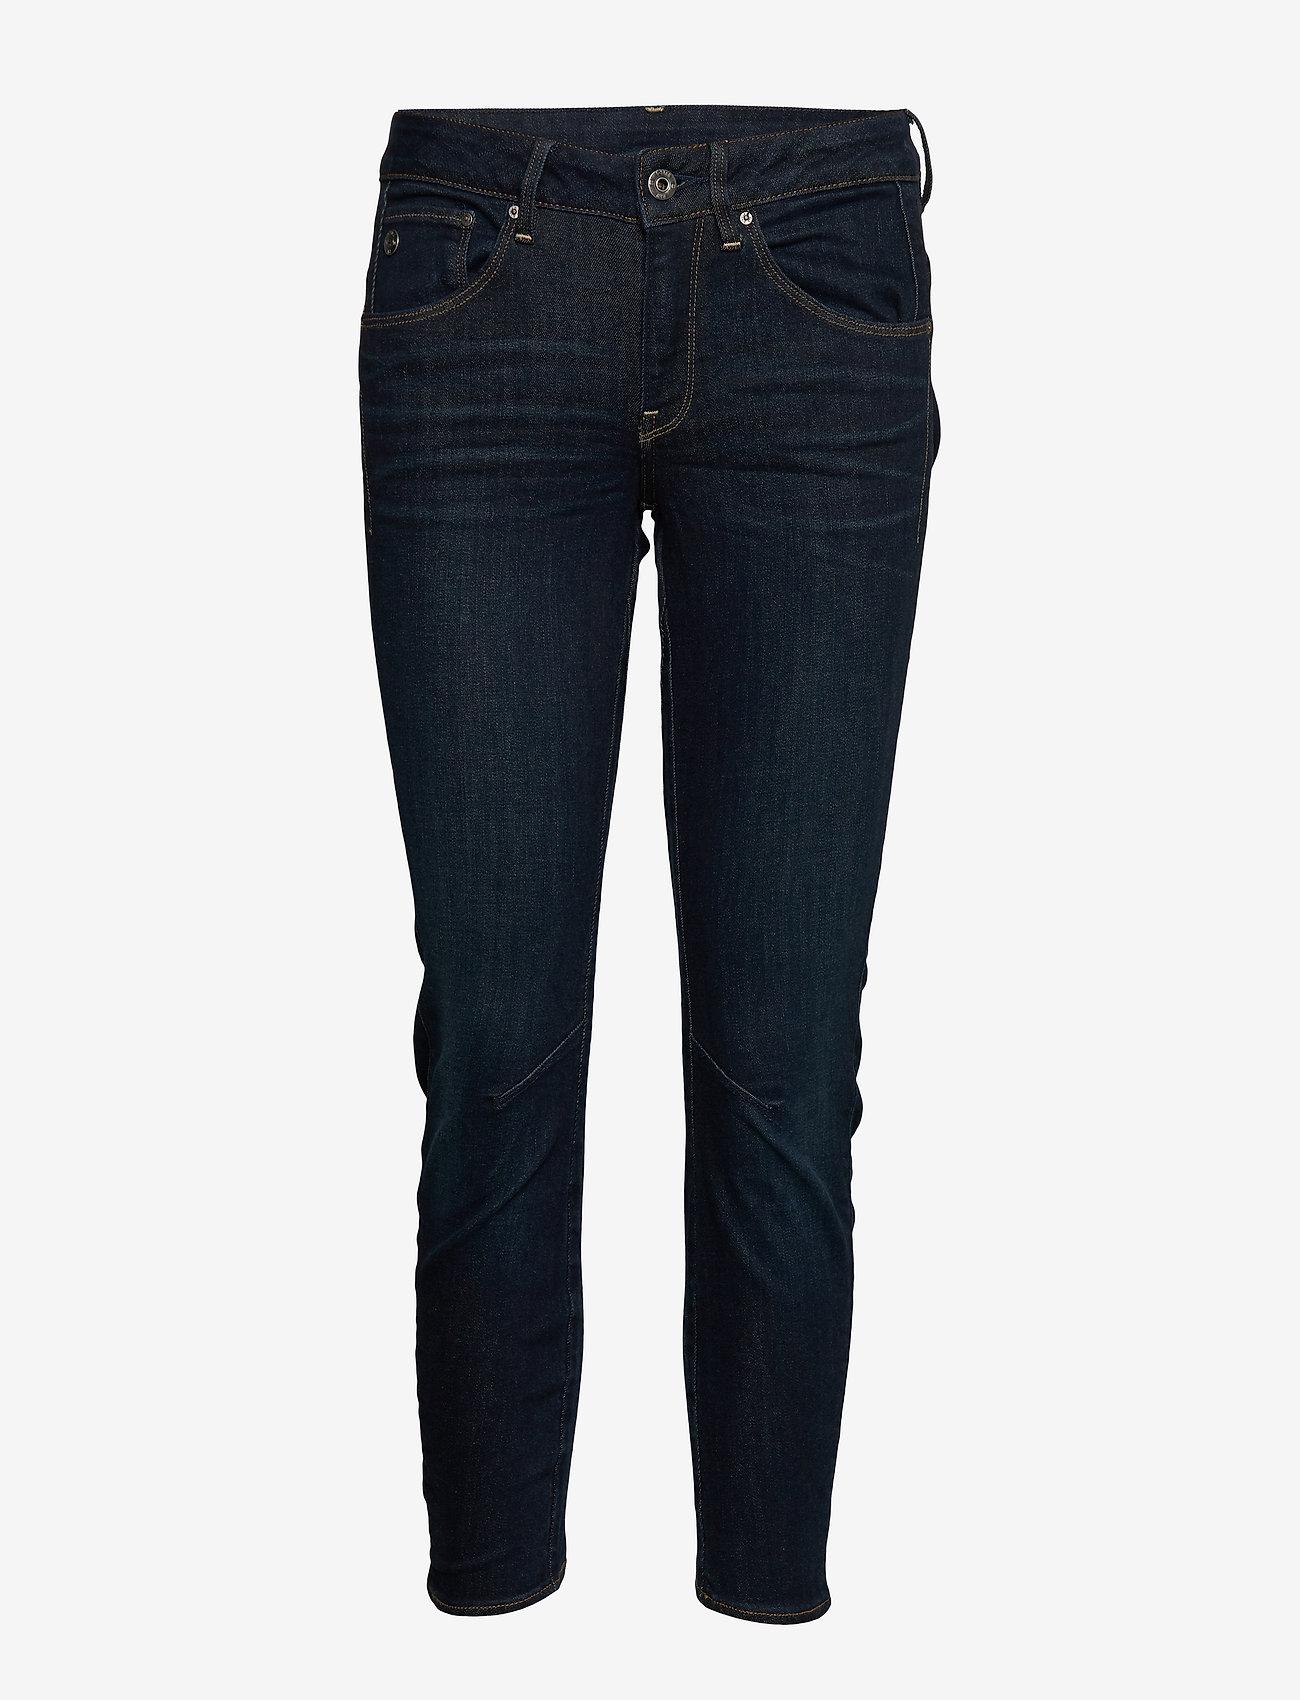 G-star RAW - Arc 3D Mid Skinny Wmn - skinny jeans - dk aged - 0